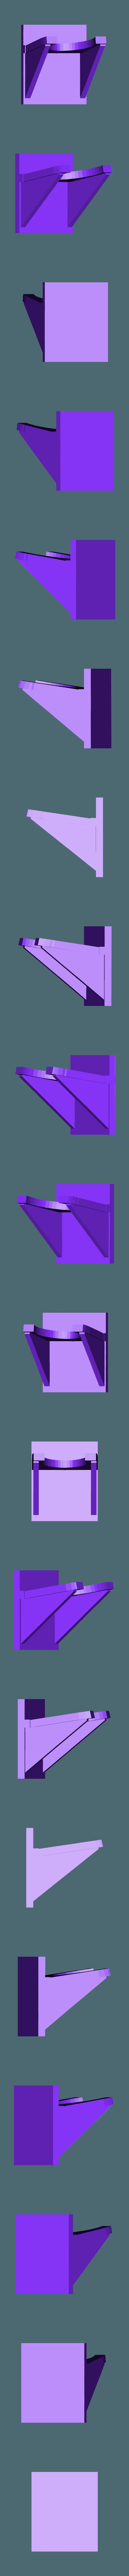 Support_Mixer_v2.stl Download free STL file Support mixeur • 3D printable model, Jak13